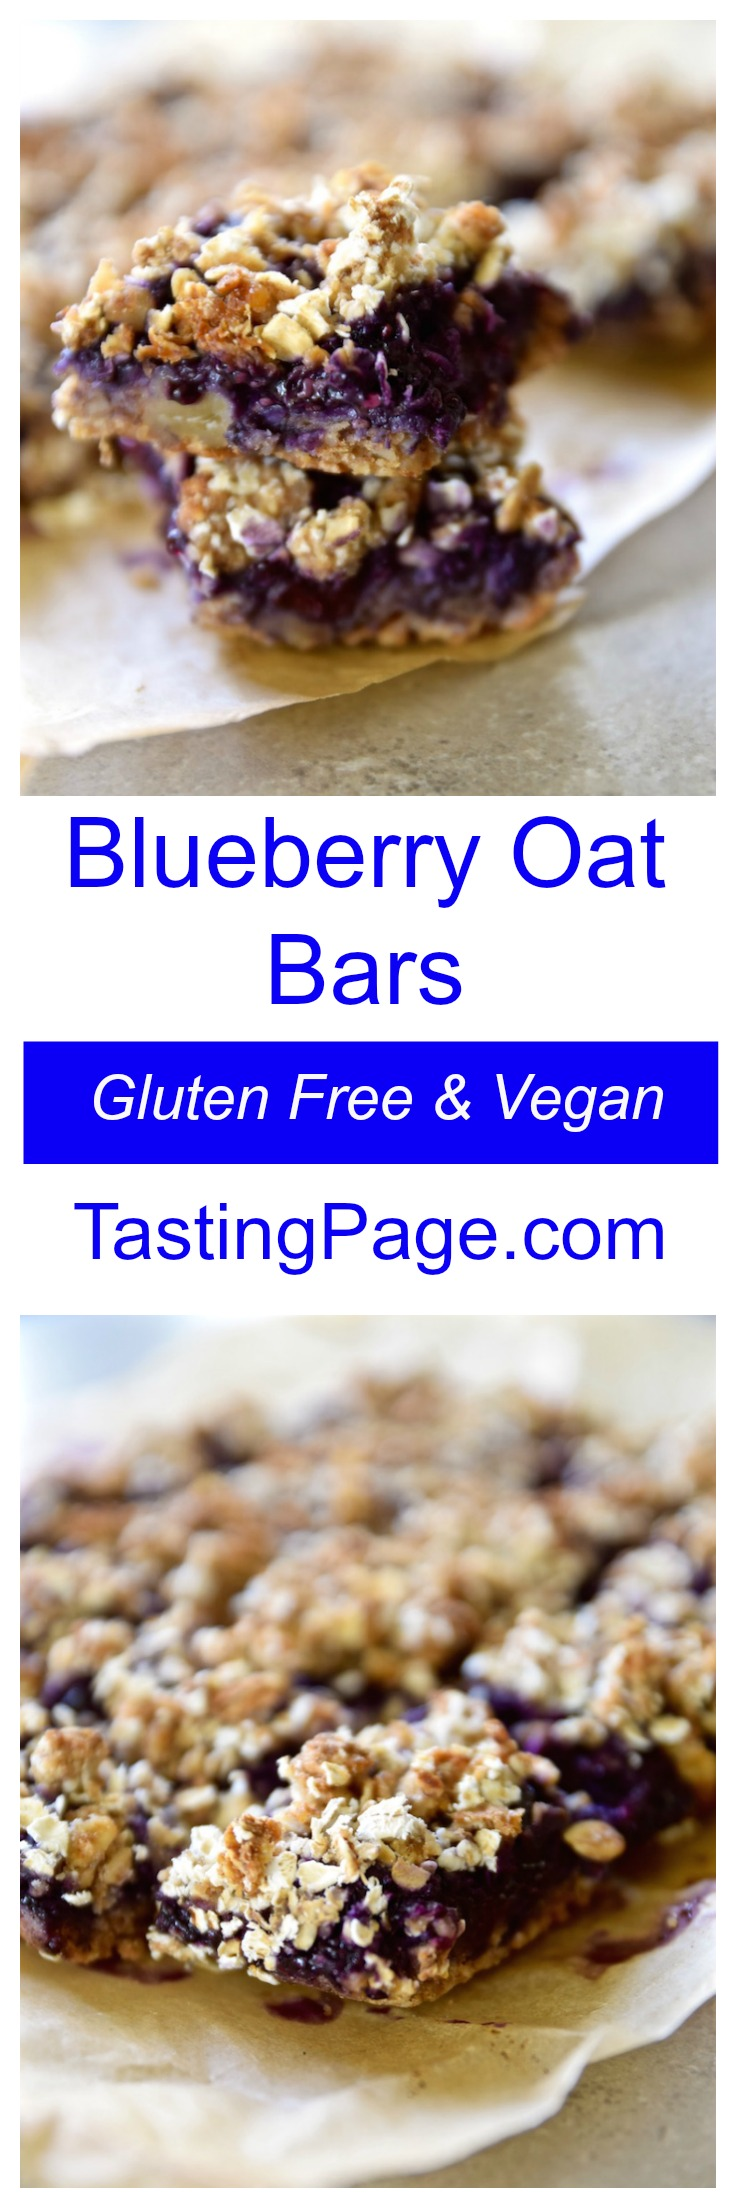 Gluten Free Vegan Blueberry Oat Bars | TastingPage.com